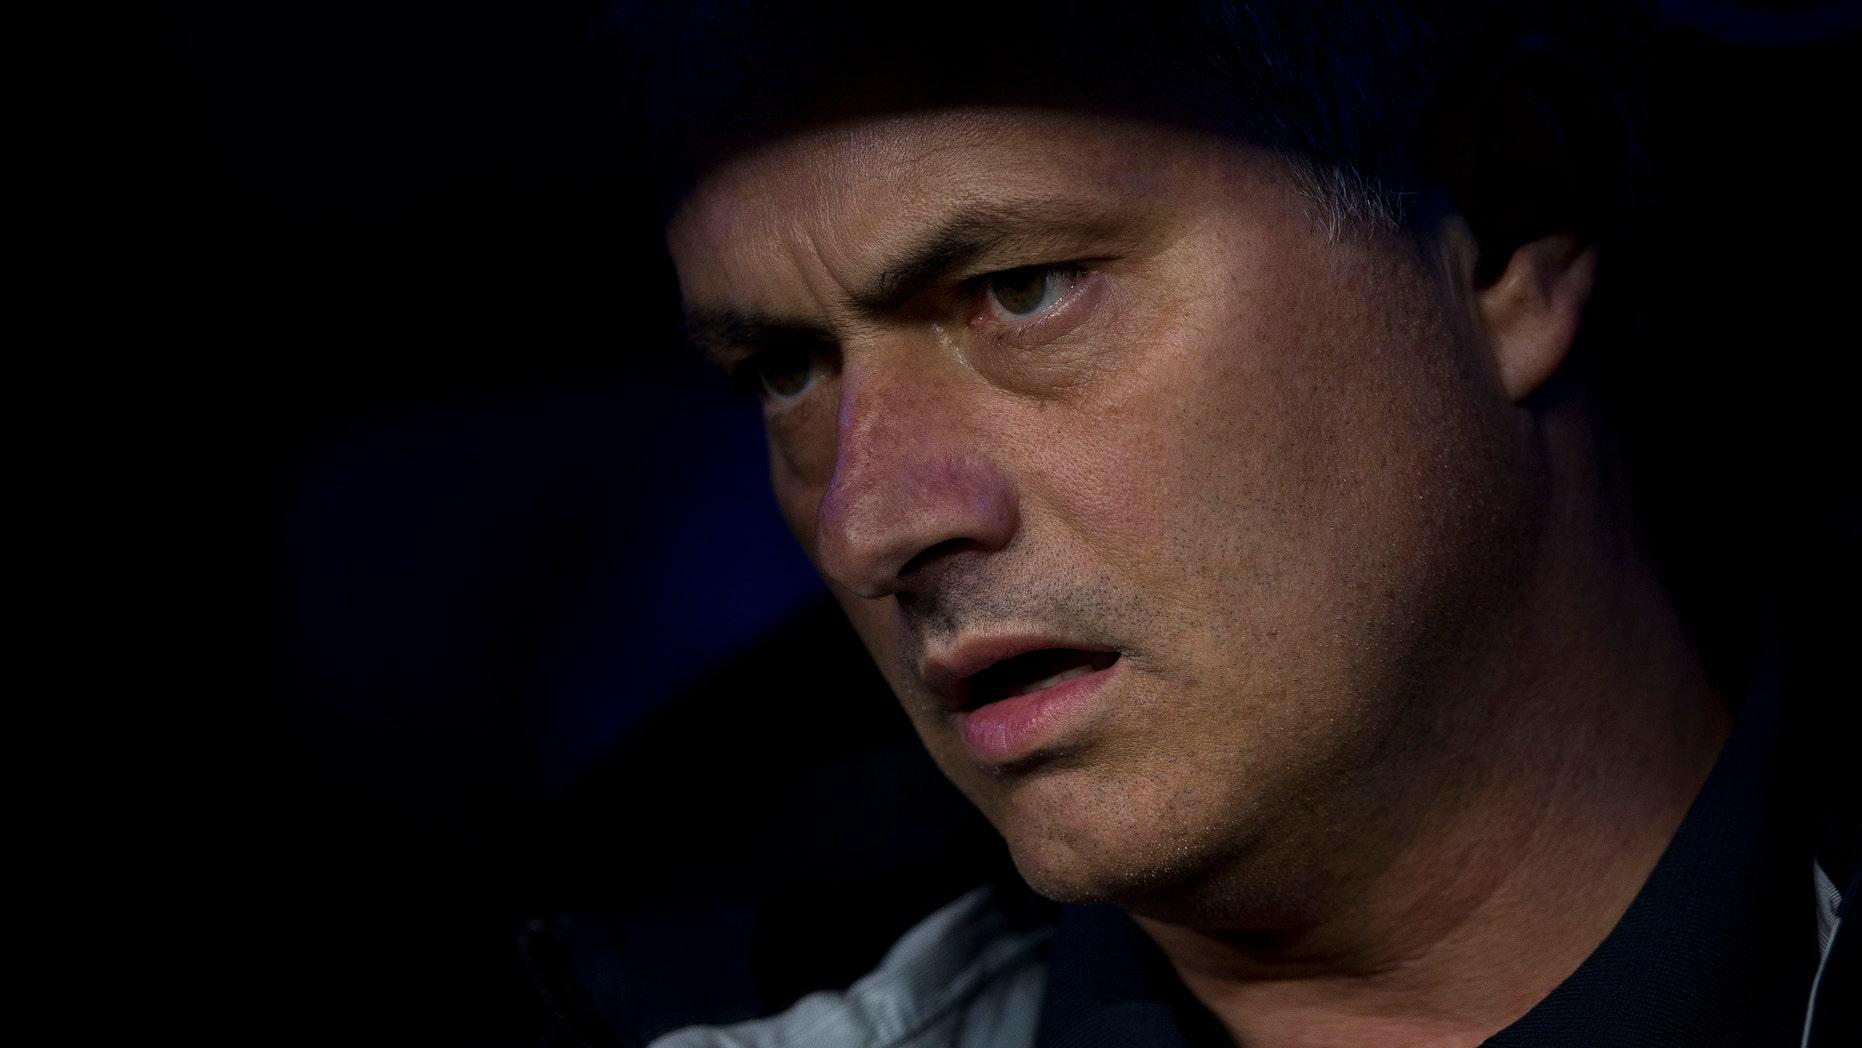 Real Madrid's coach Jose Mourinho from Portugal reacts during a Spanish La Liga soccer match against Malaga at the Santiago Bernabeu stadium, in Madrid, on Wednesday, May 8, 2013. (AP Photo/Daniel Ochoa de Olza)